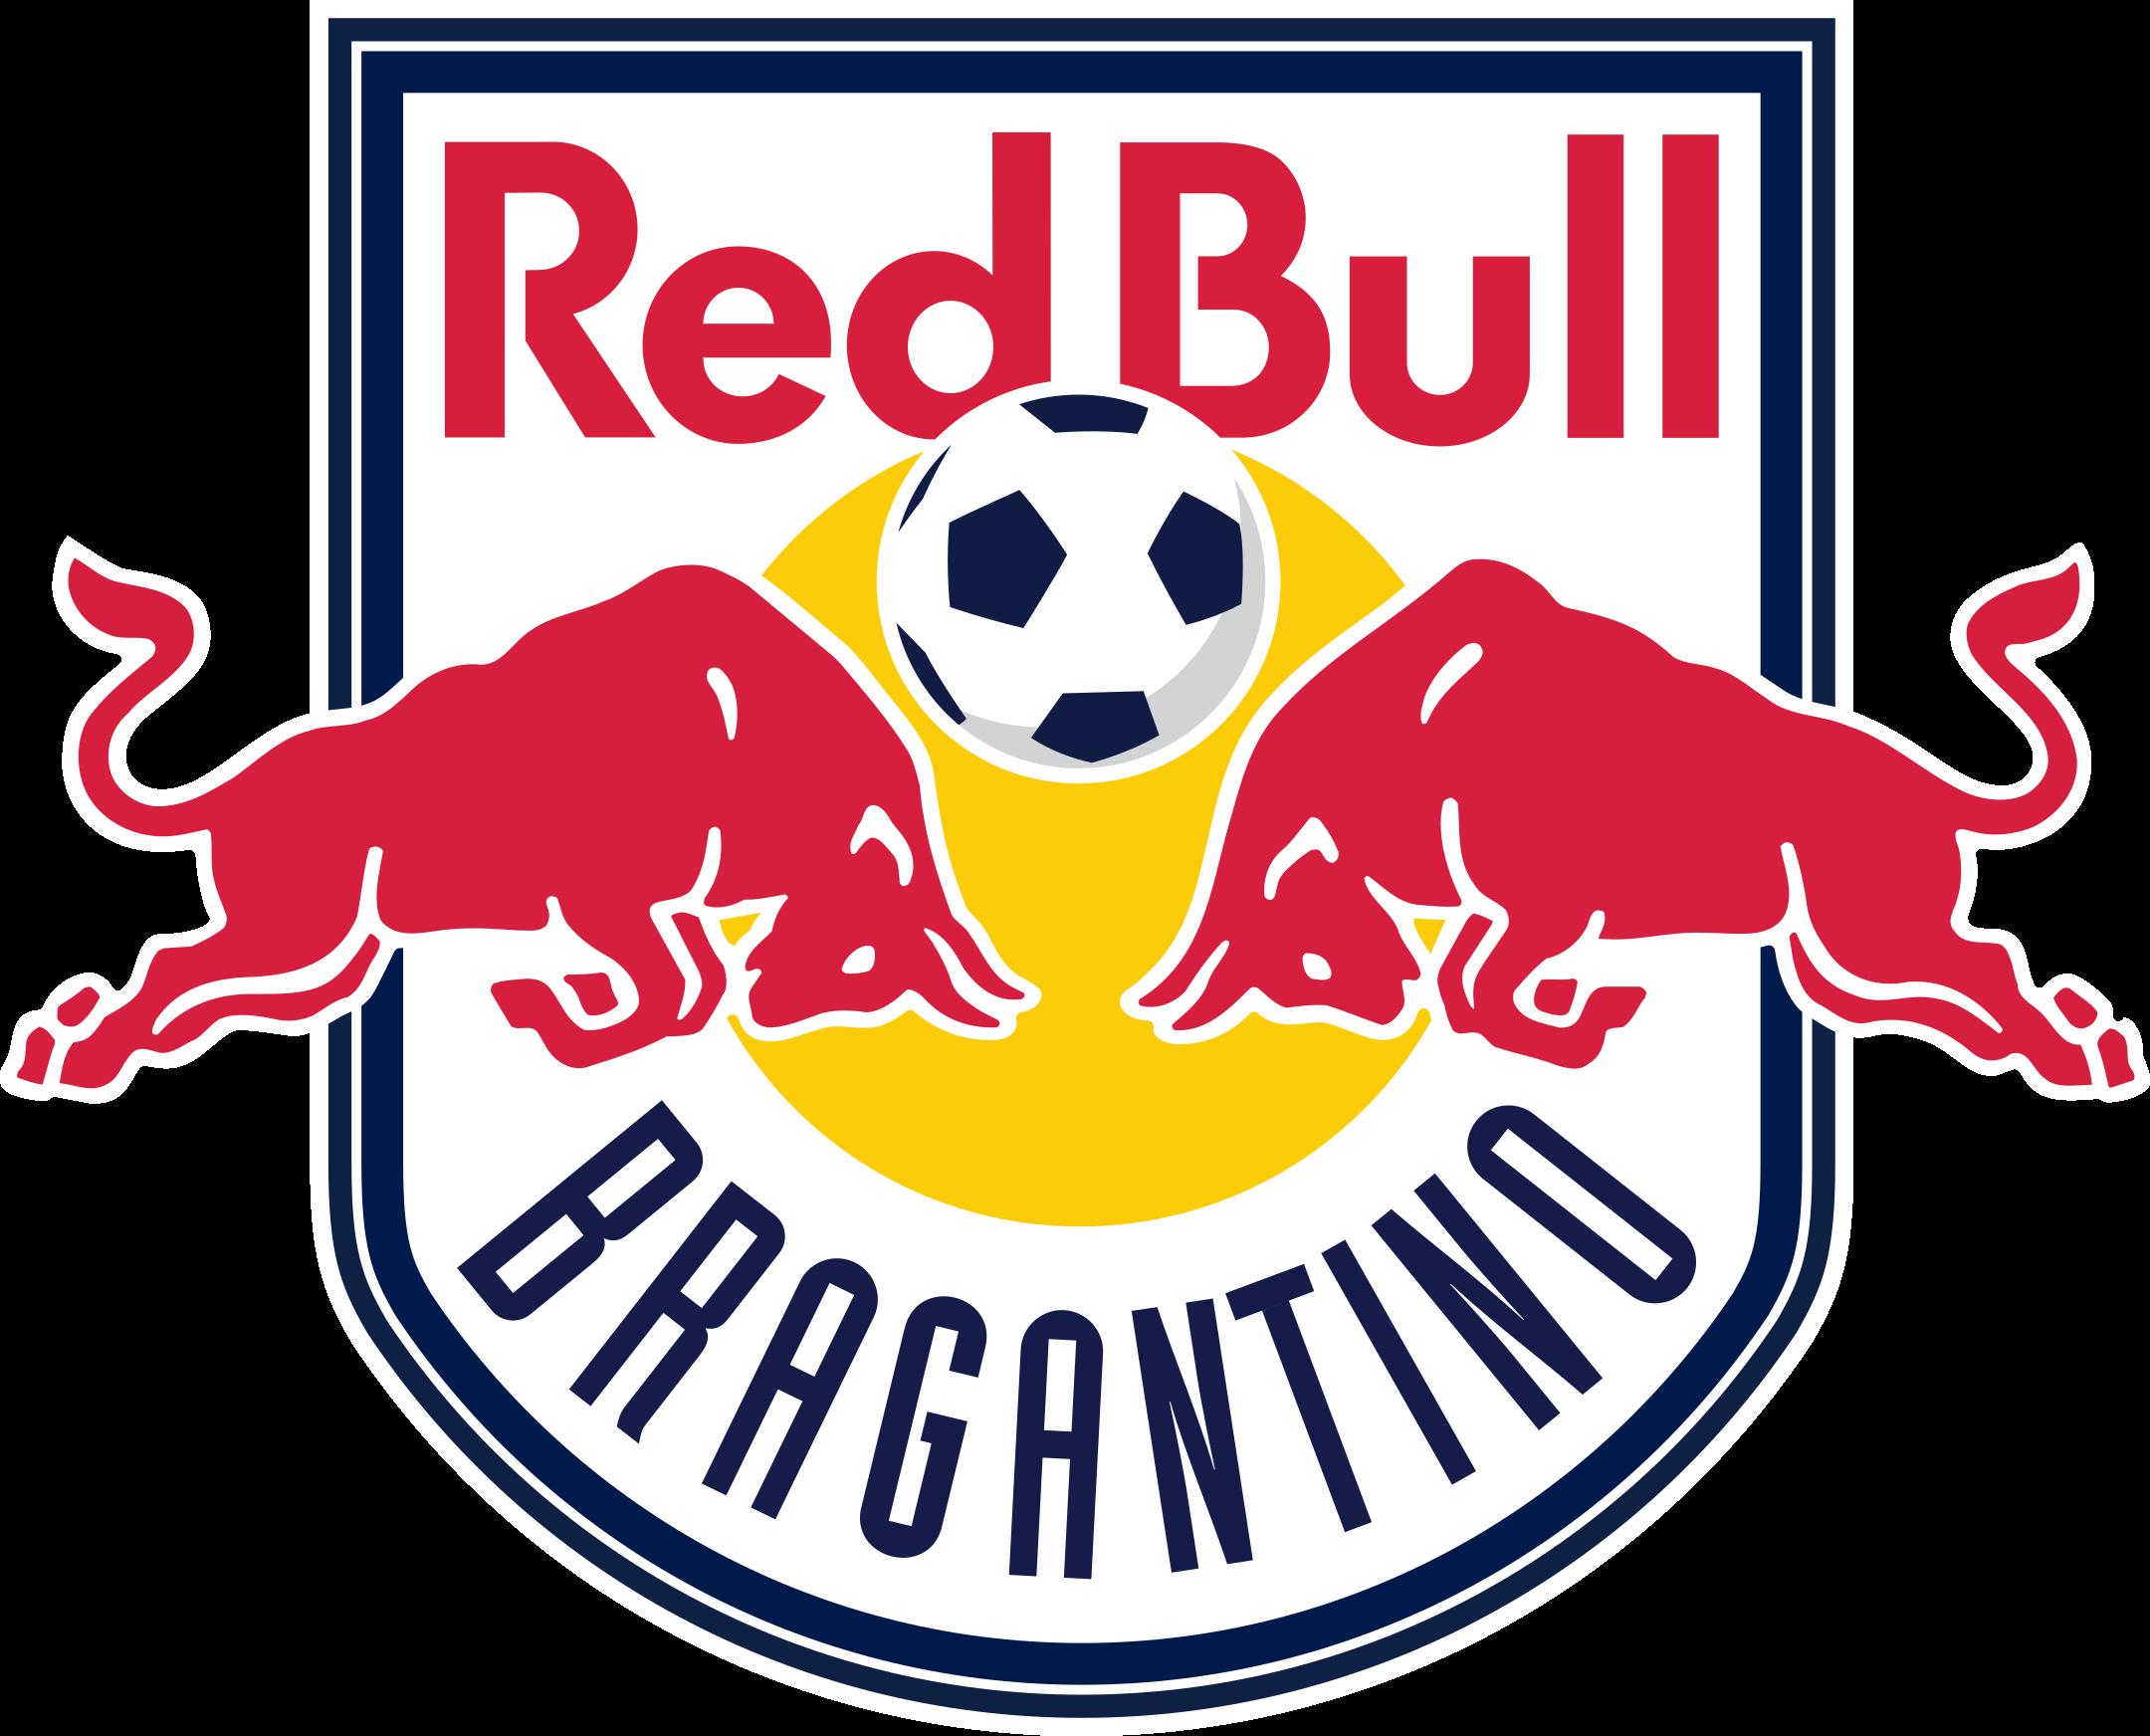 red bull bragantino logo 1 - Red Bull Bragantino Logo